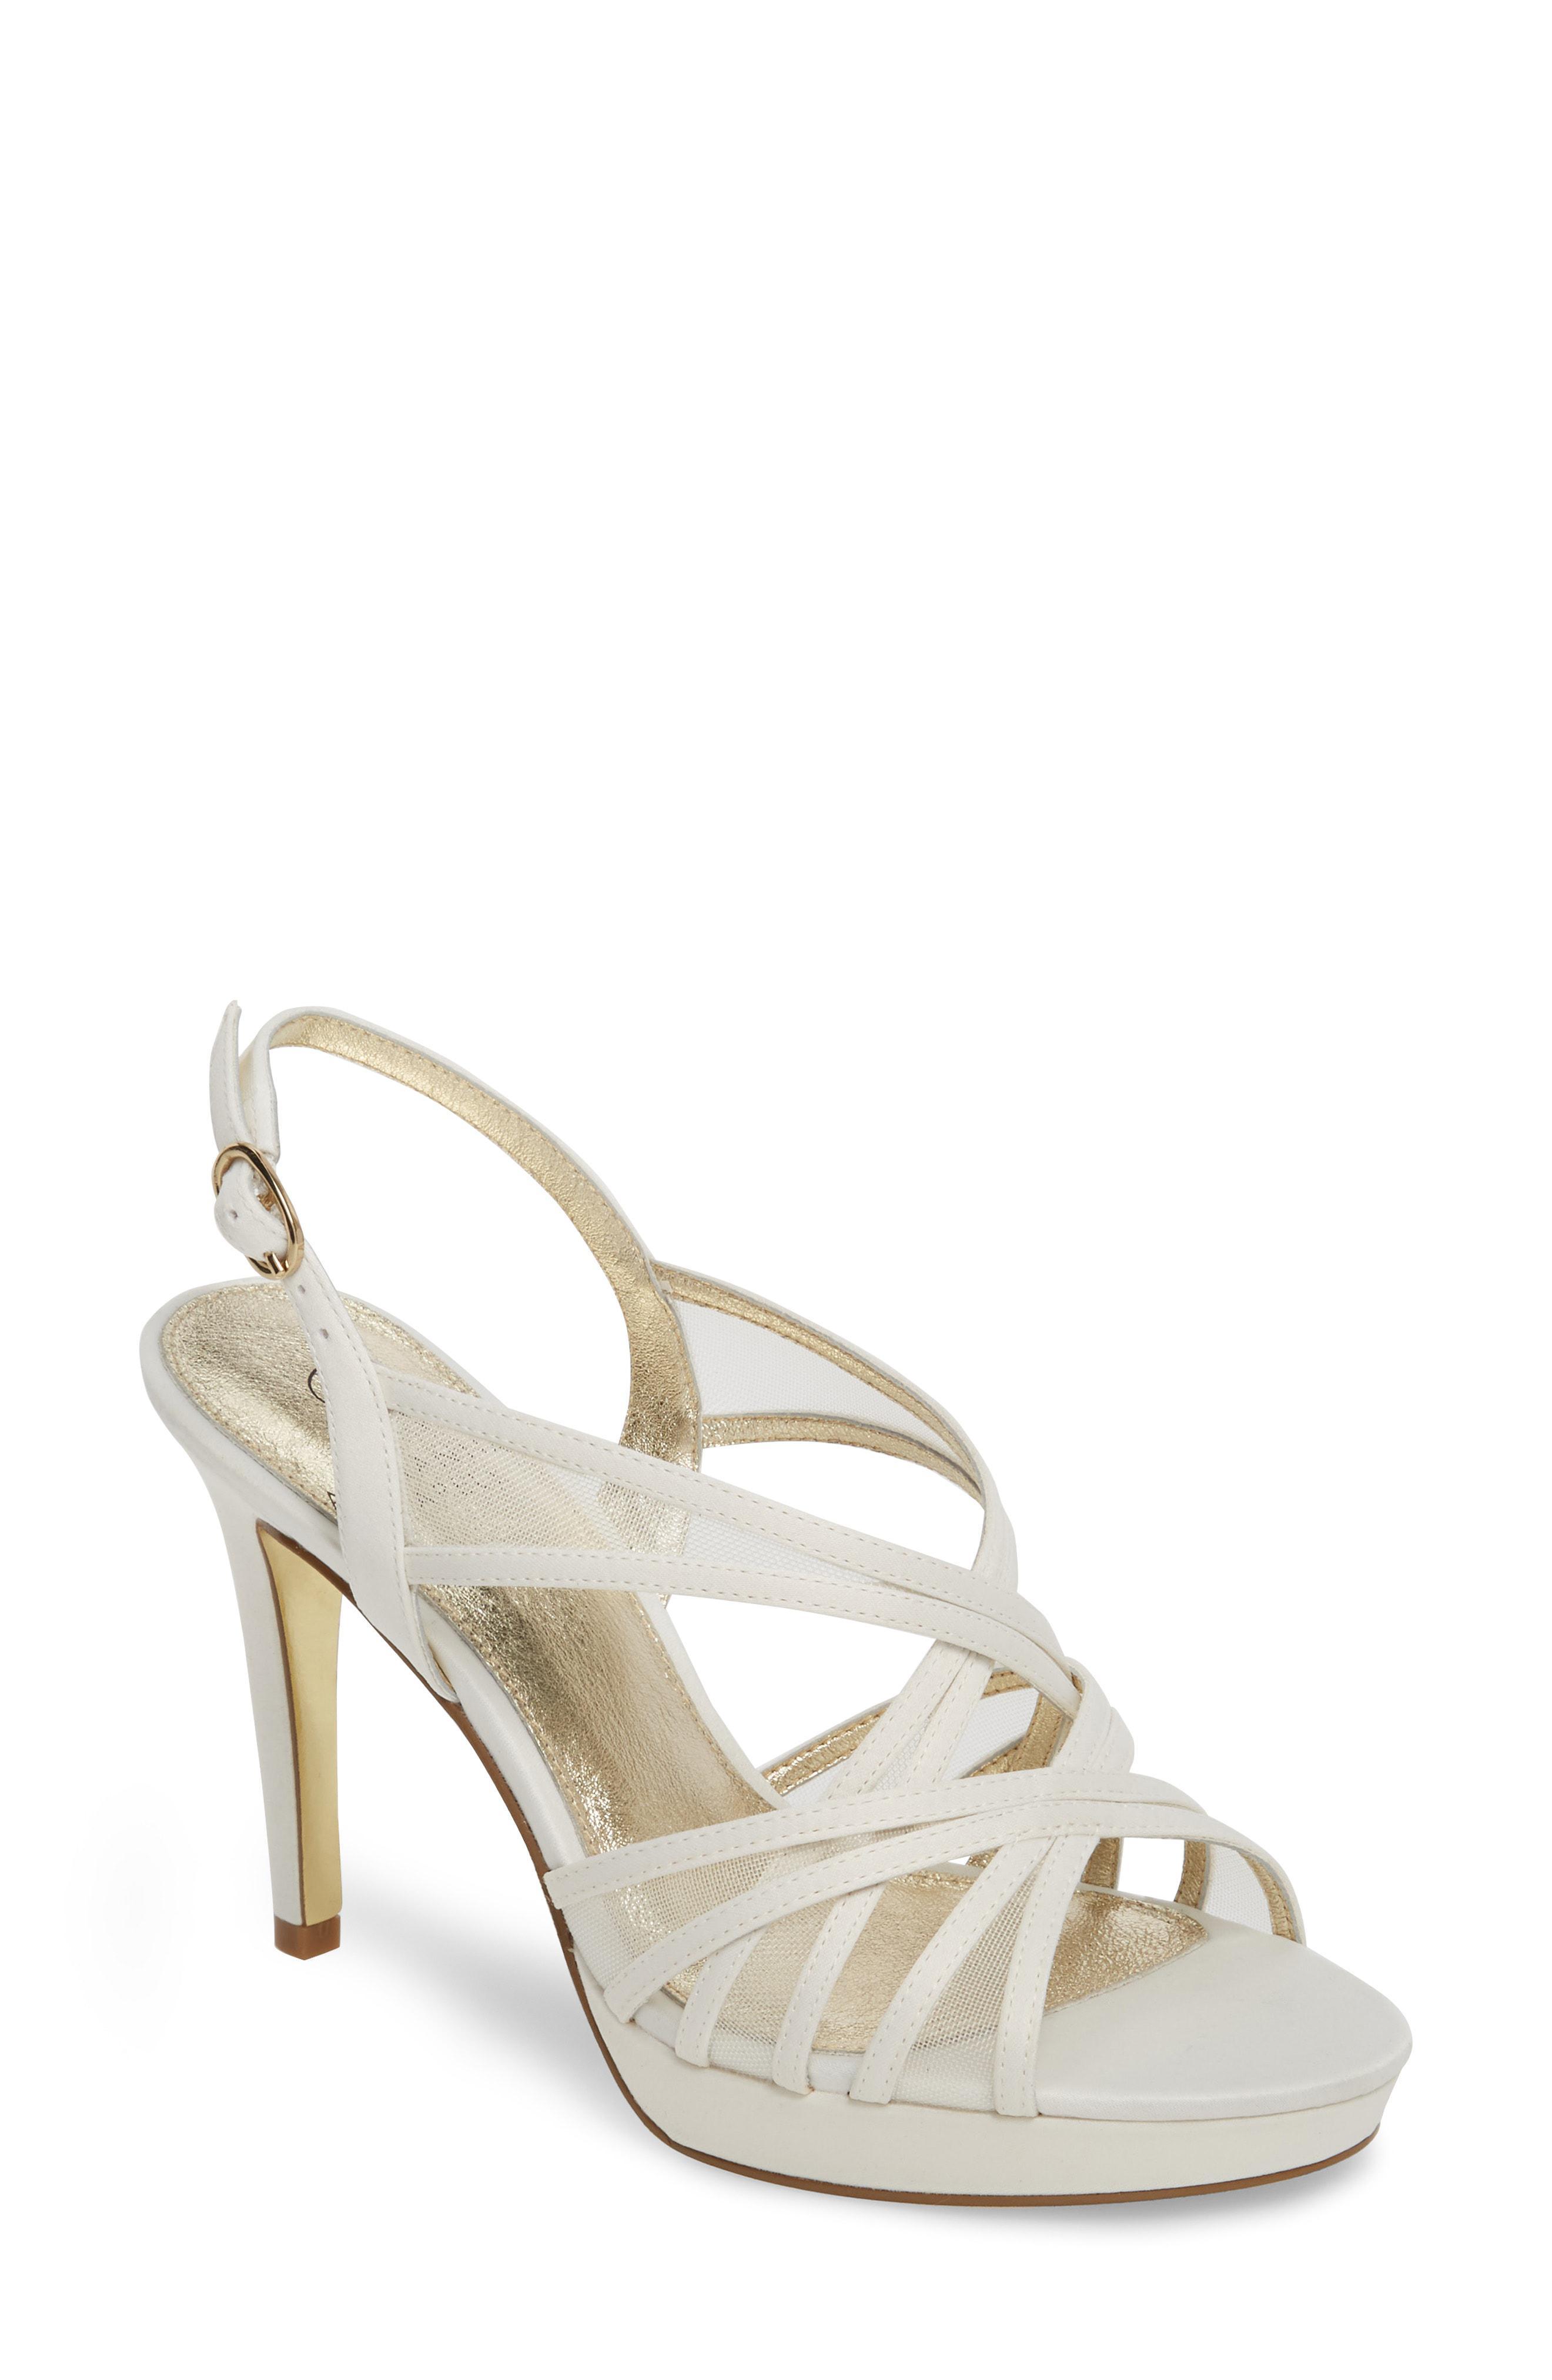 f3d6954a119 Lyst - Adrianna Papell Adri Platform Sandal in Metallic